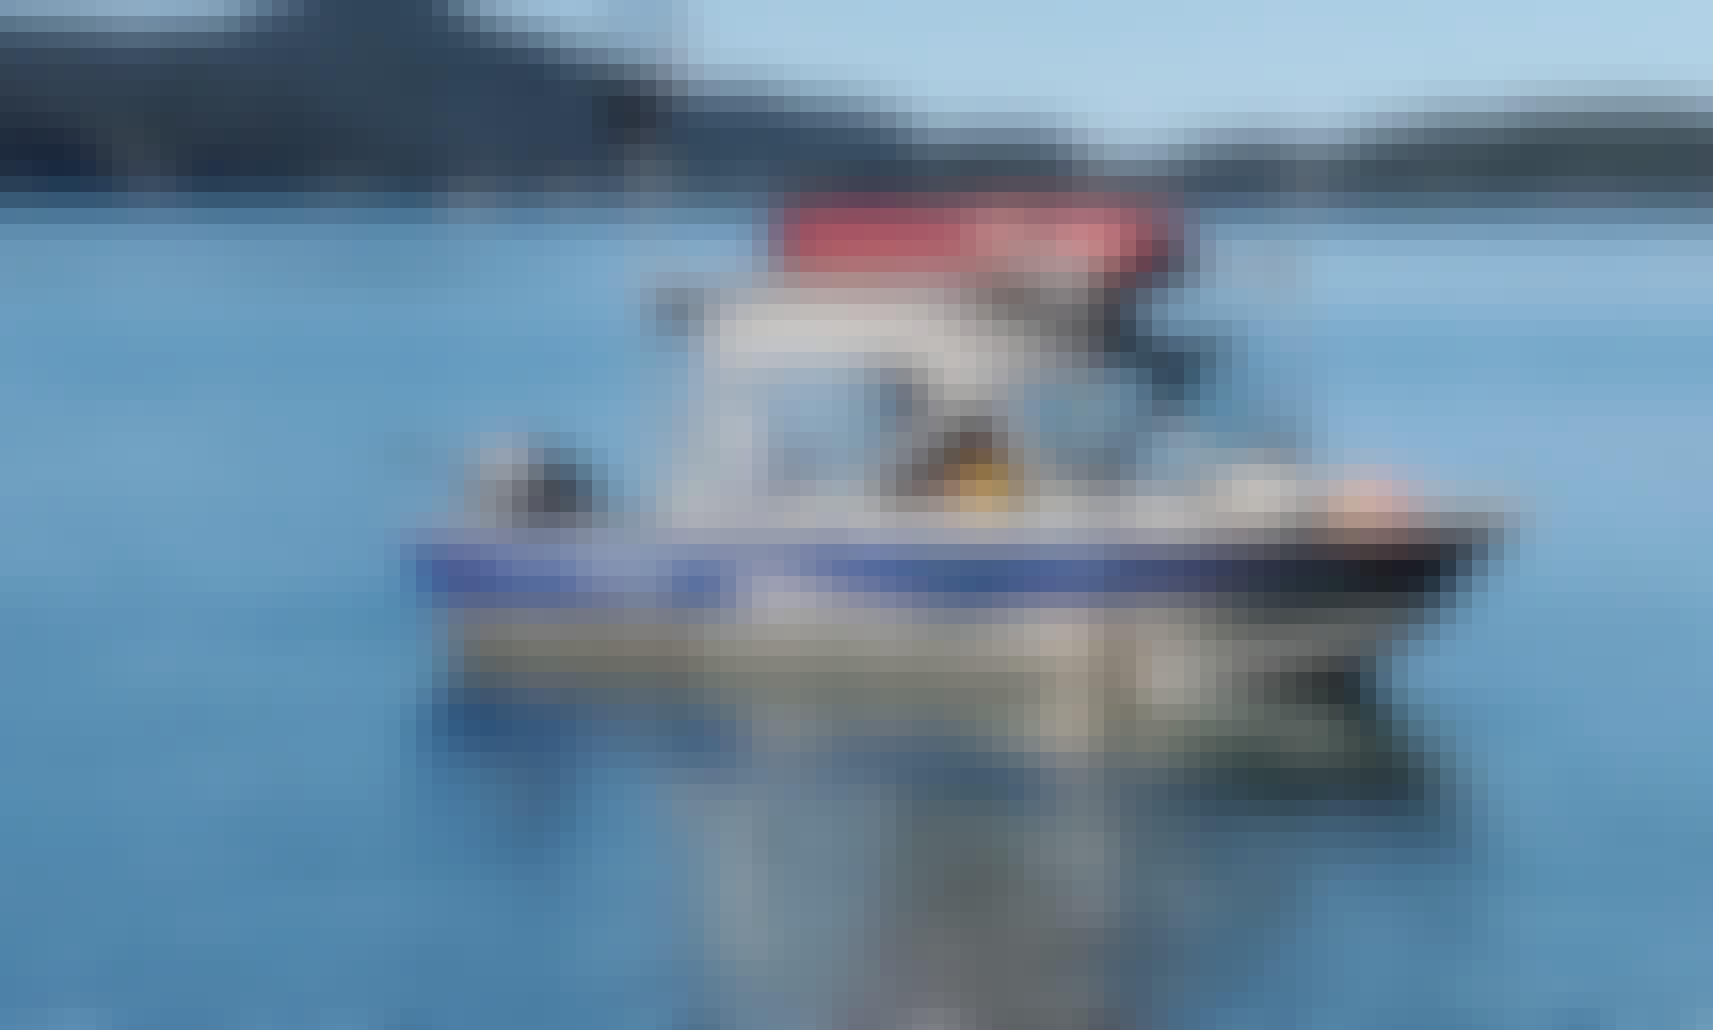 Rent a Hewescraft Sea Runner 200 Sport Fishing Vessel for 6 people in Homer, Alaska